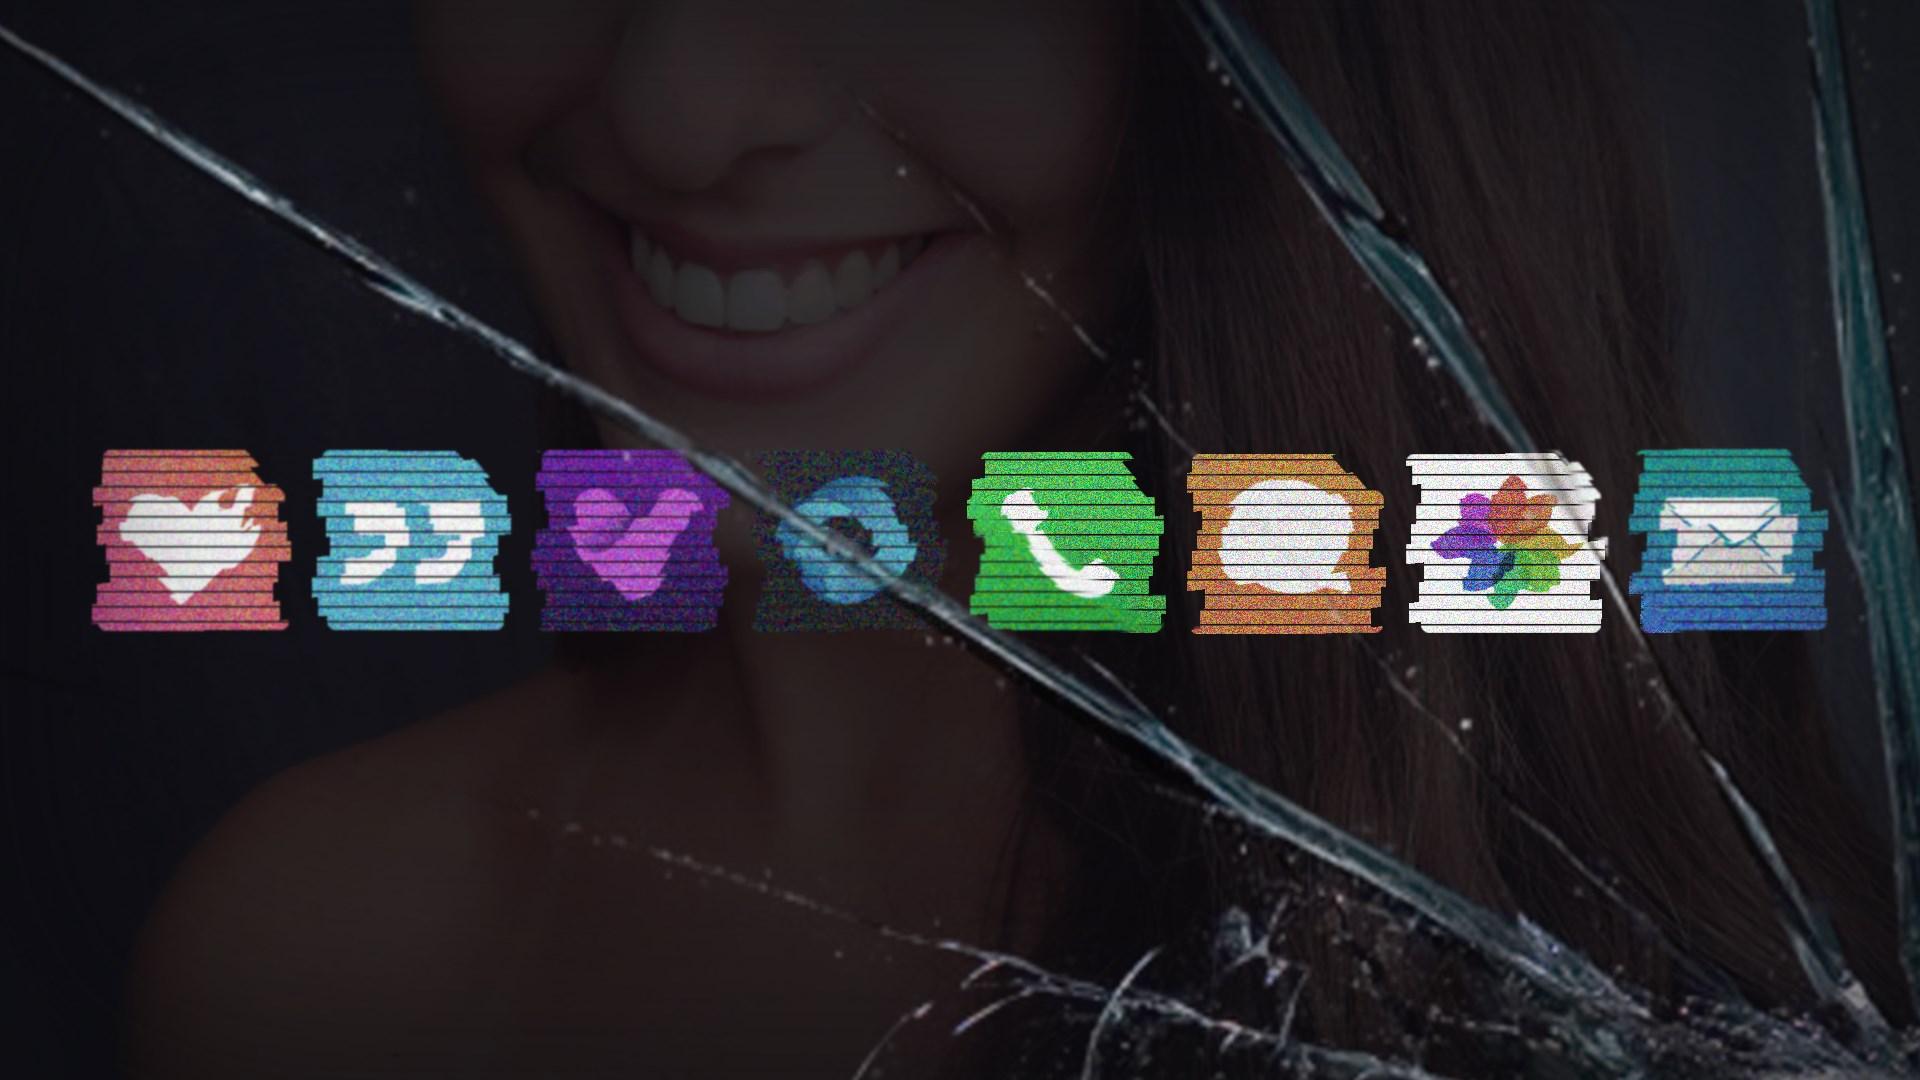 en natt Stand dating app